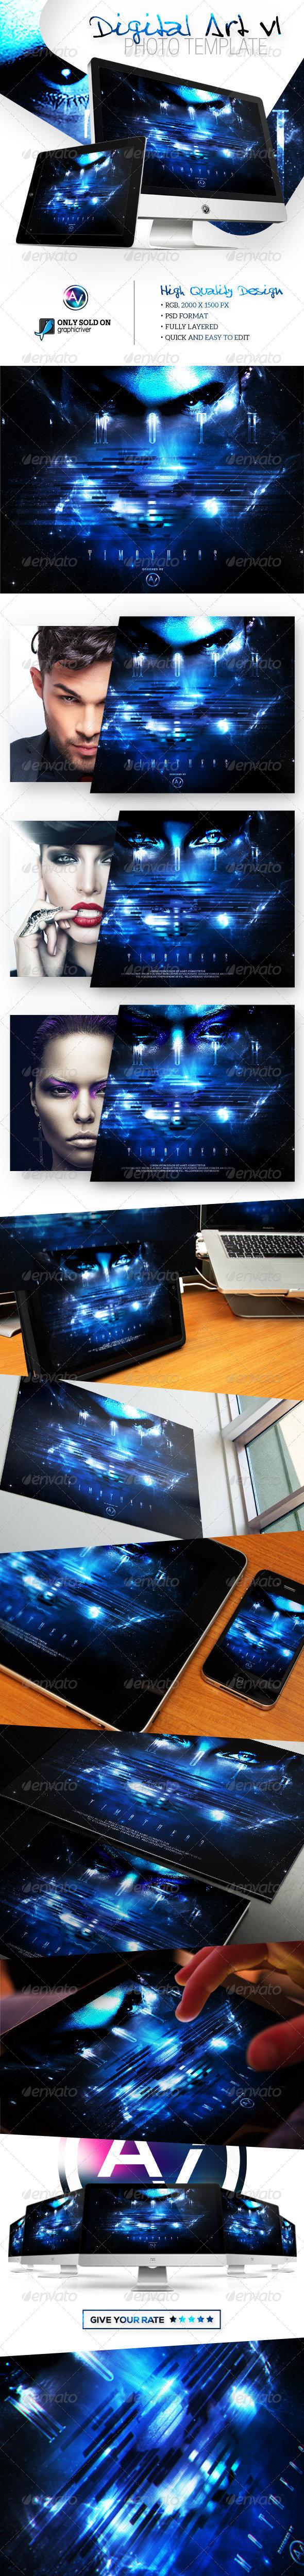 Digital Art Photo Template V1 - Tech / Futuristic Photo Templates